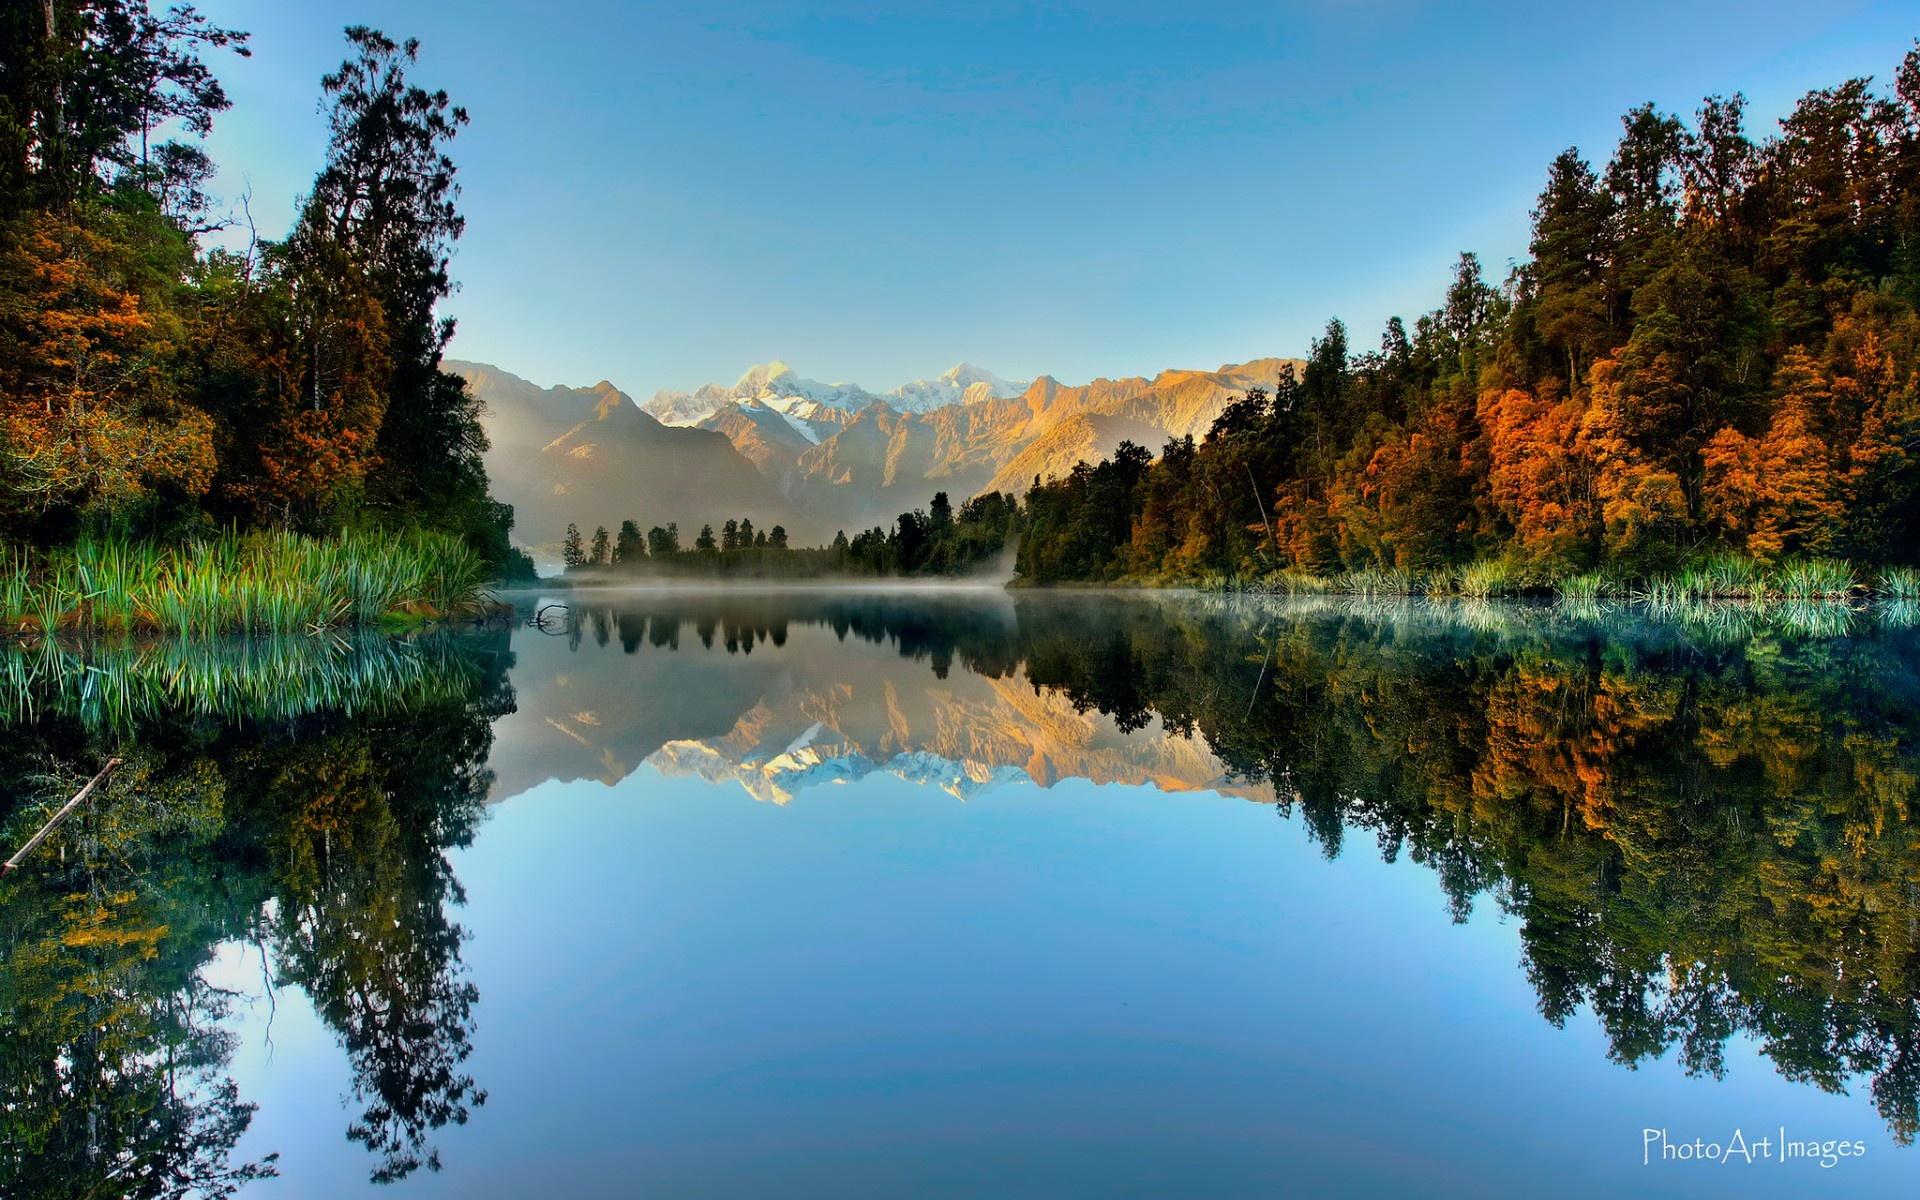 Amazing Lake Matheson Pictures & Backgrounds